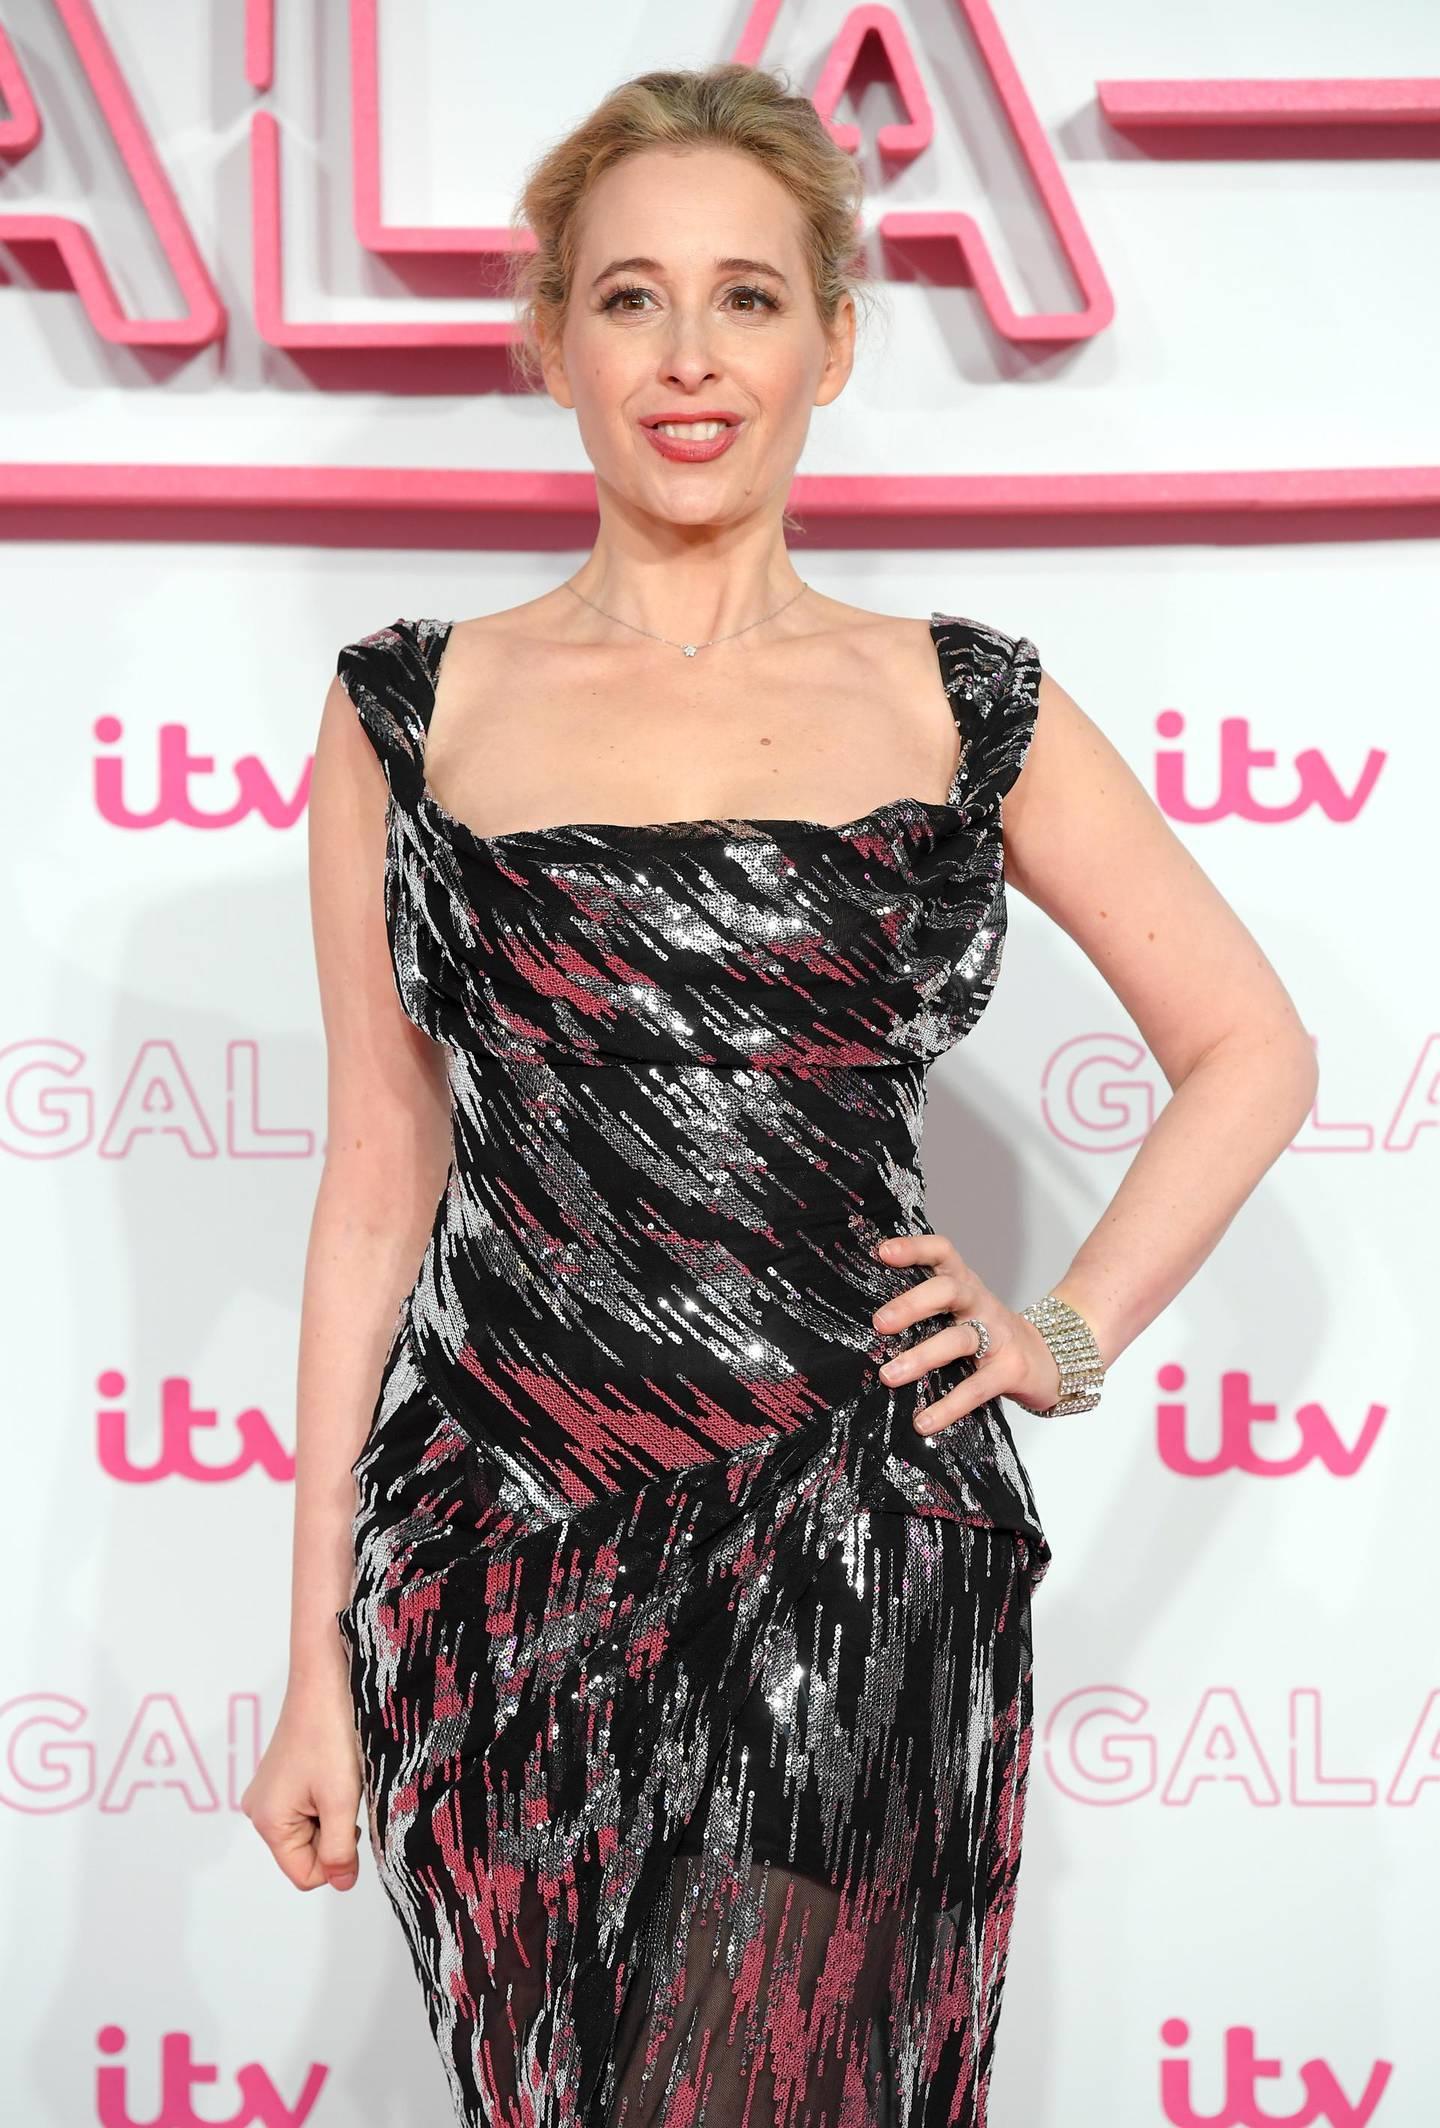 LONDON, ENGLAND - NOVEMBER 24:  Noreena Hertz attends the ITV Gala at London Palladium on November 24, 2016 in London, England.  (Photo by Karwai Tang/WireImage)